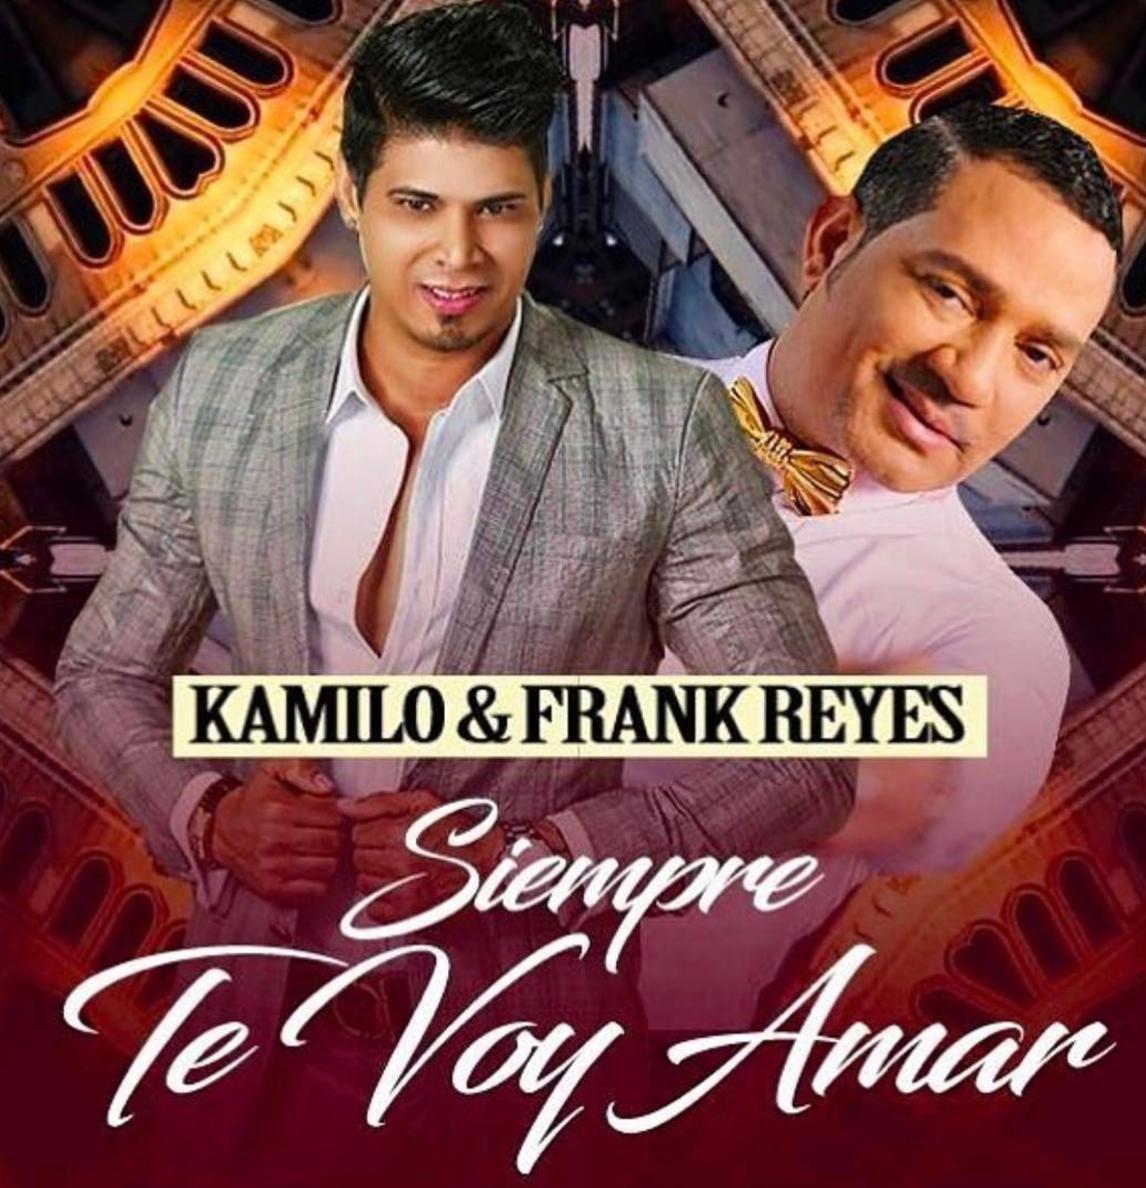 Frank-Reyes-ft.-K-Milo-Siempre-te-voy-amar